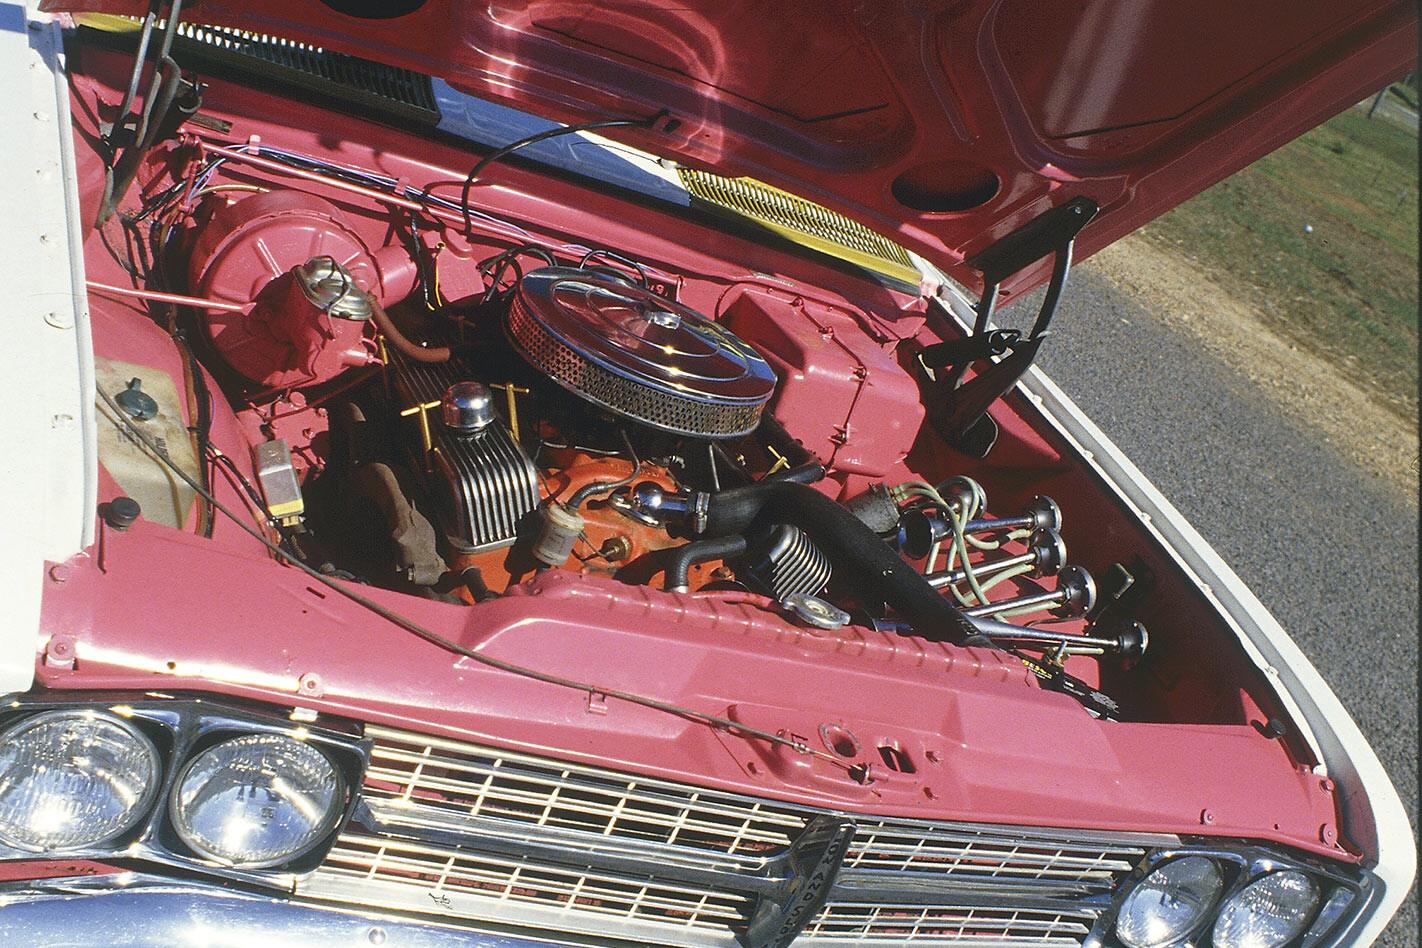 Burrito Durado Holden Brougham engine bay